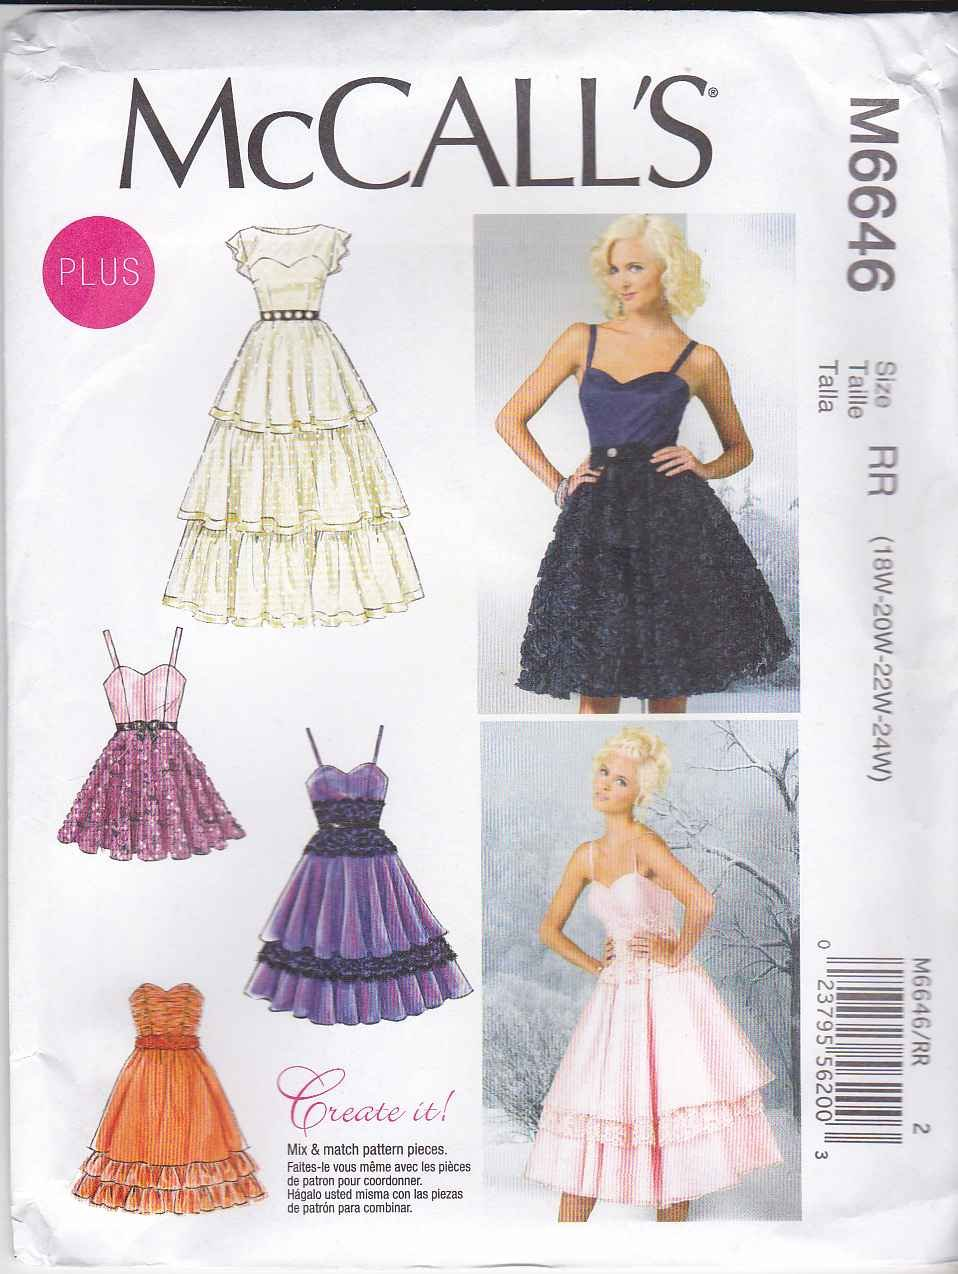 Mccalls Sewing Pattern 6646 Womens Plus Size 18w 24w